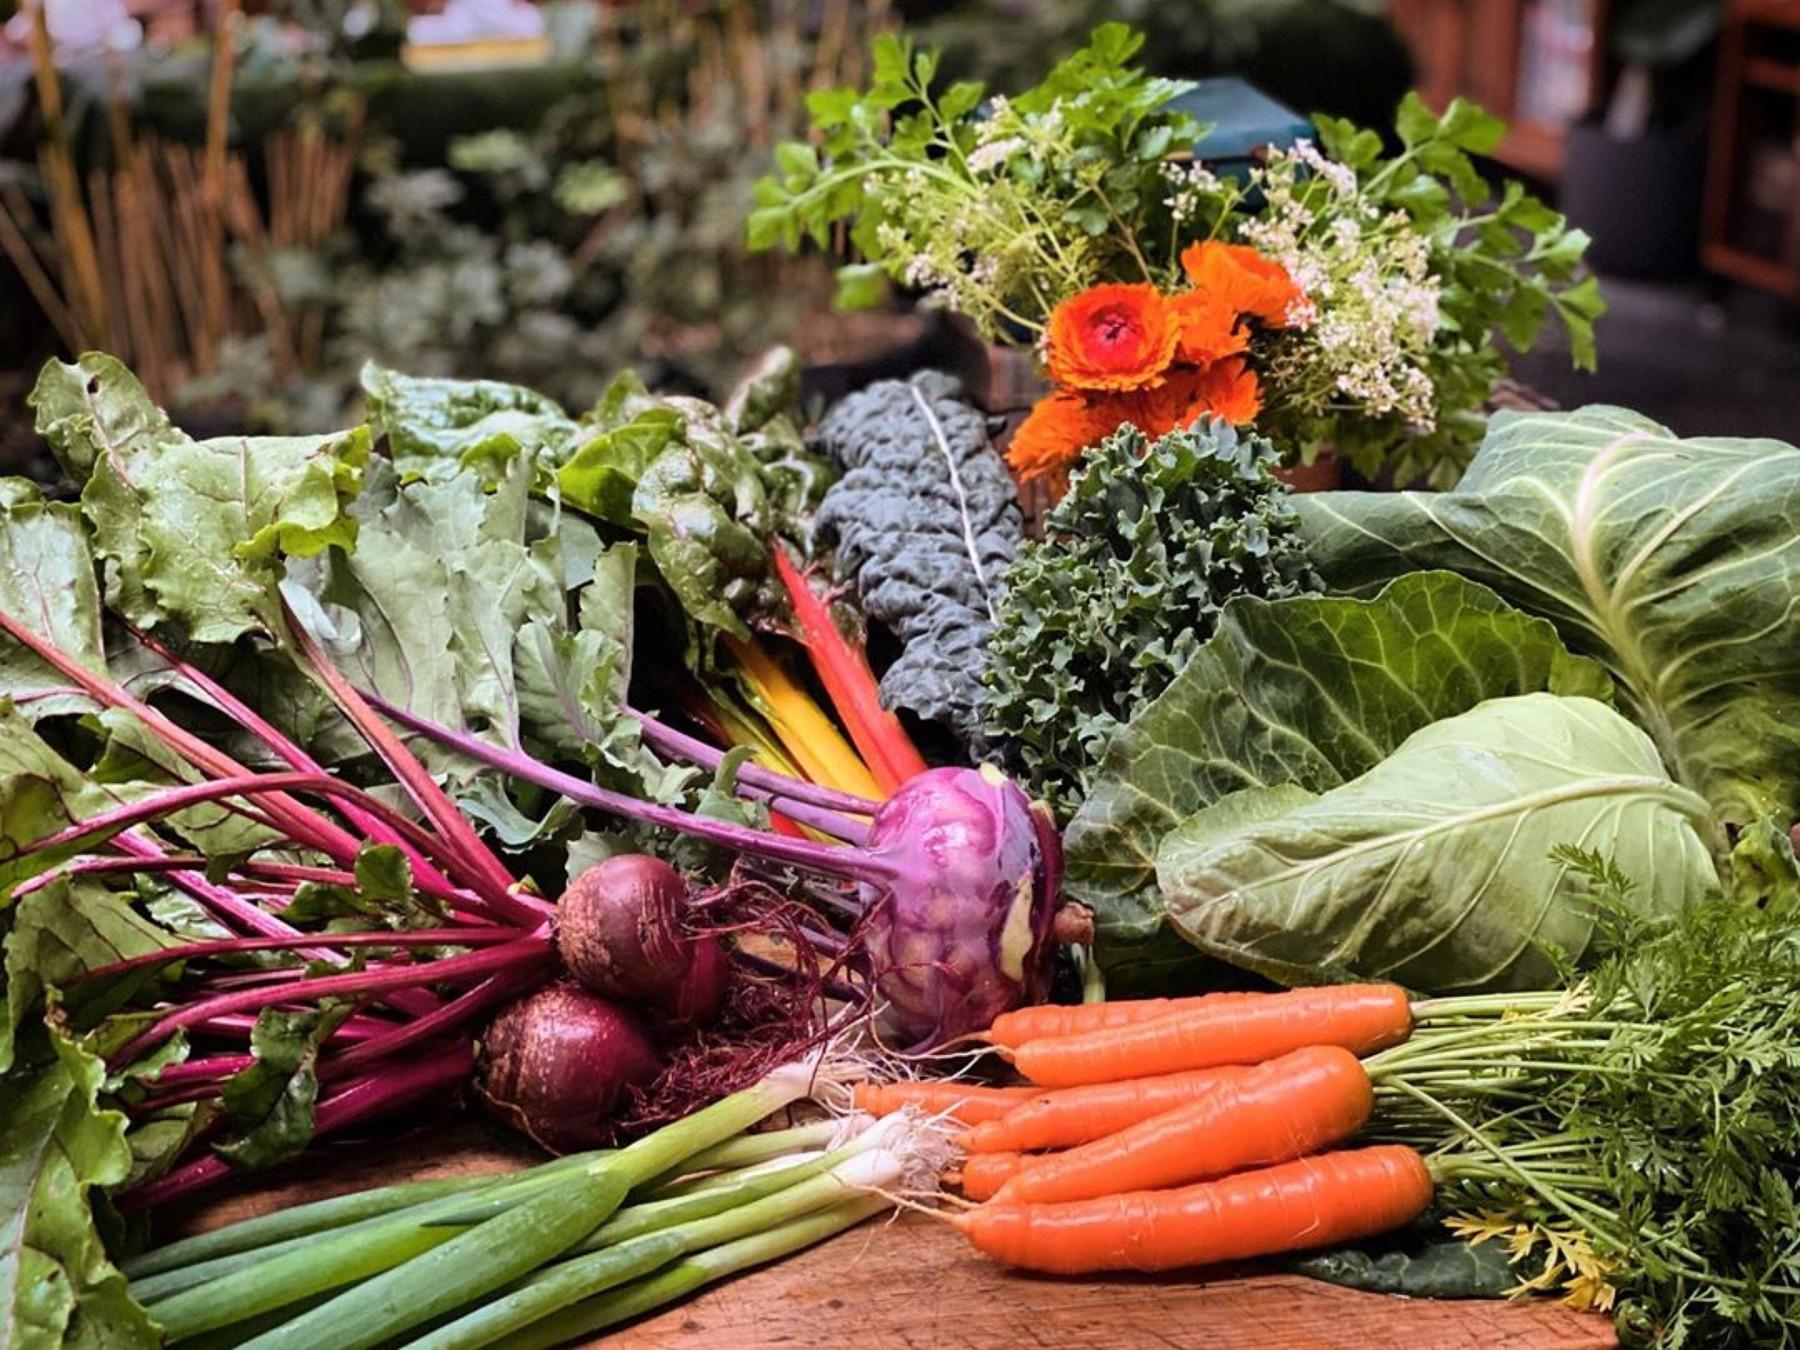 Mystwood Harvest produce